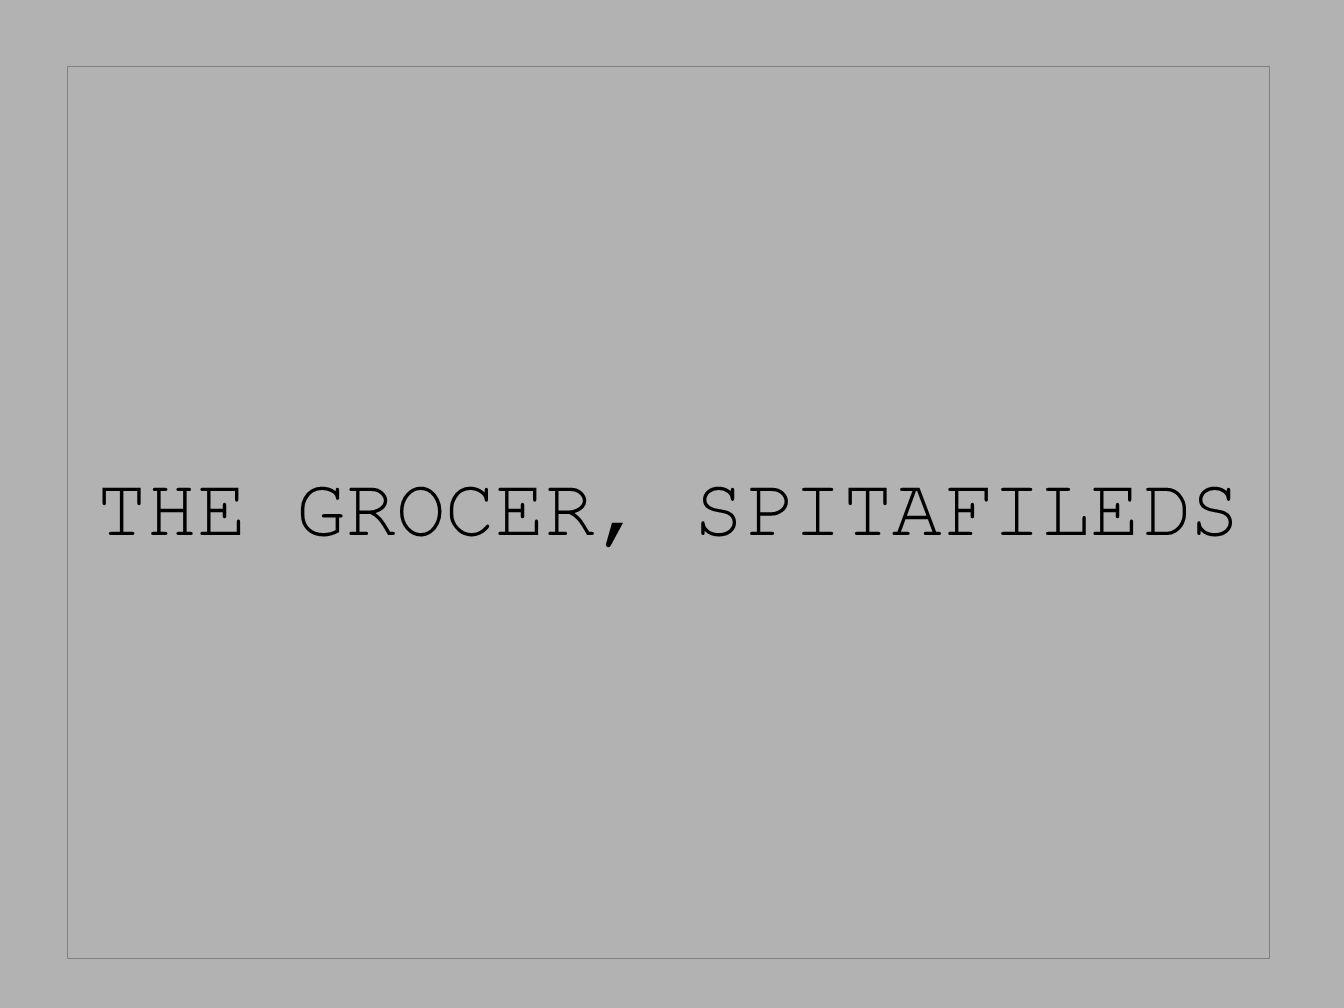 THE GROCER, SPITAFILEDS